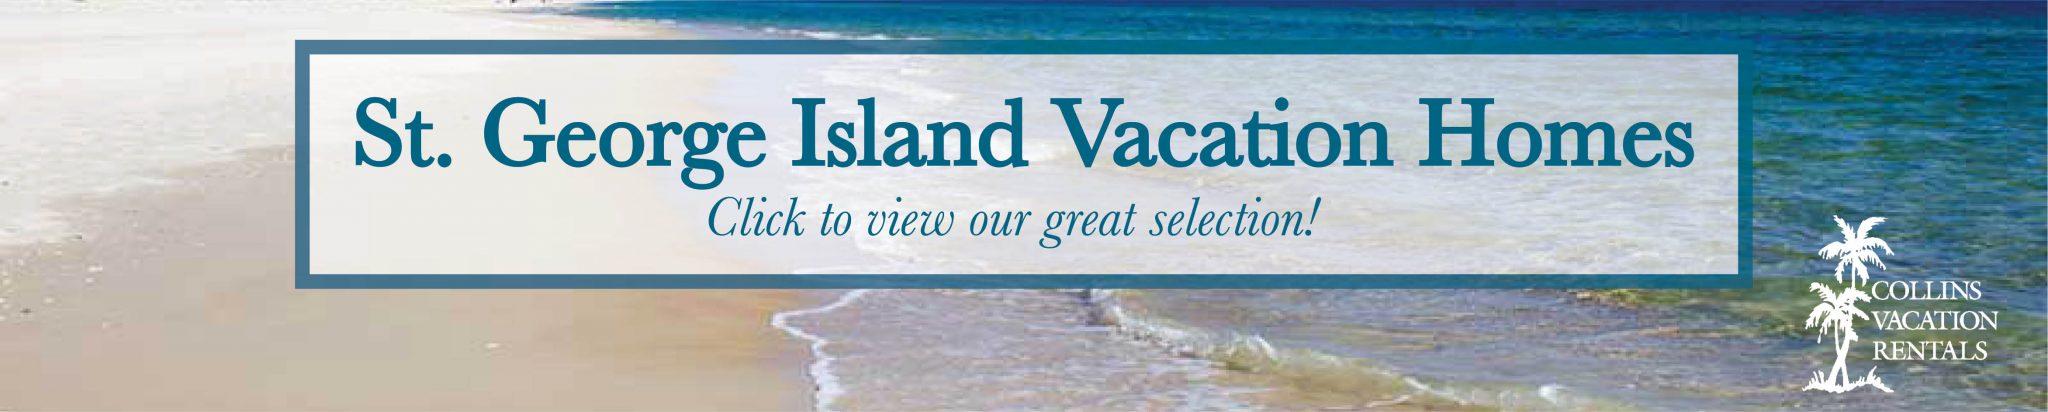 Collins Vacation Rentals, Inc.